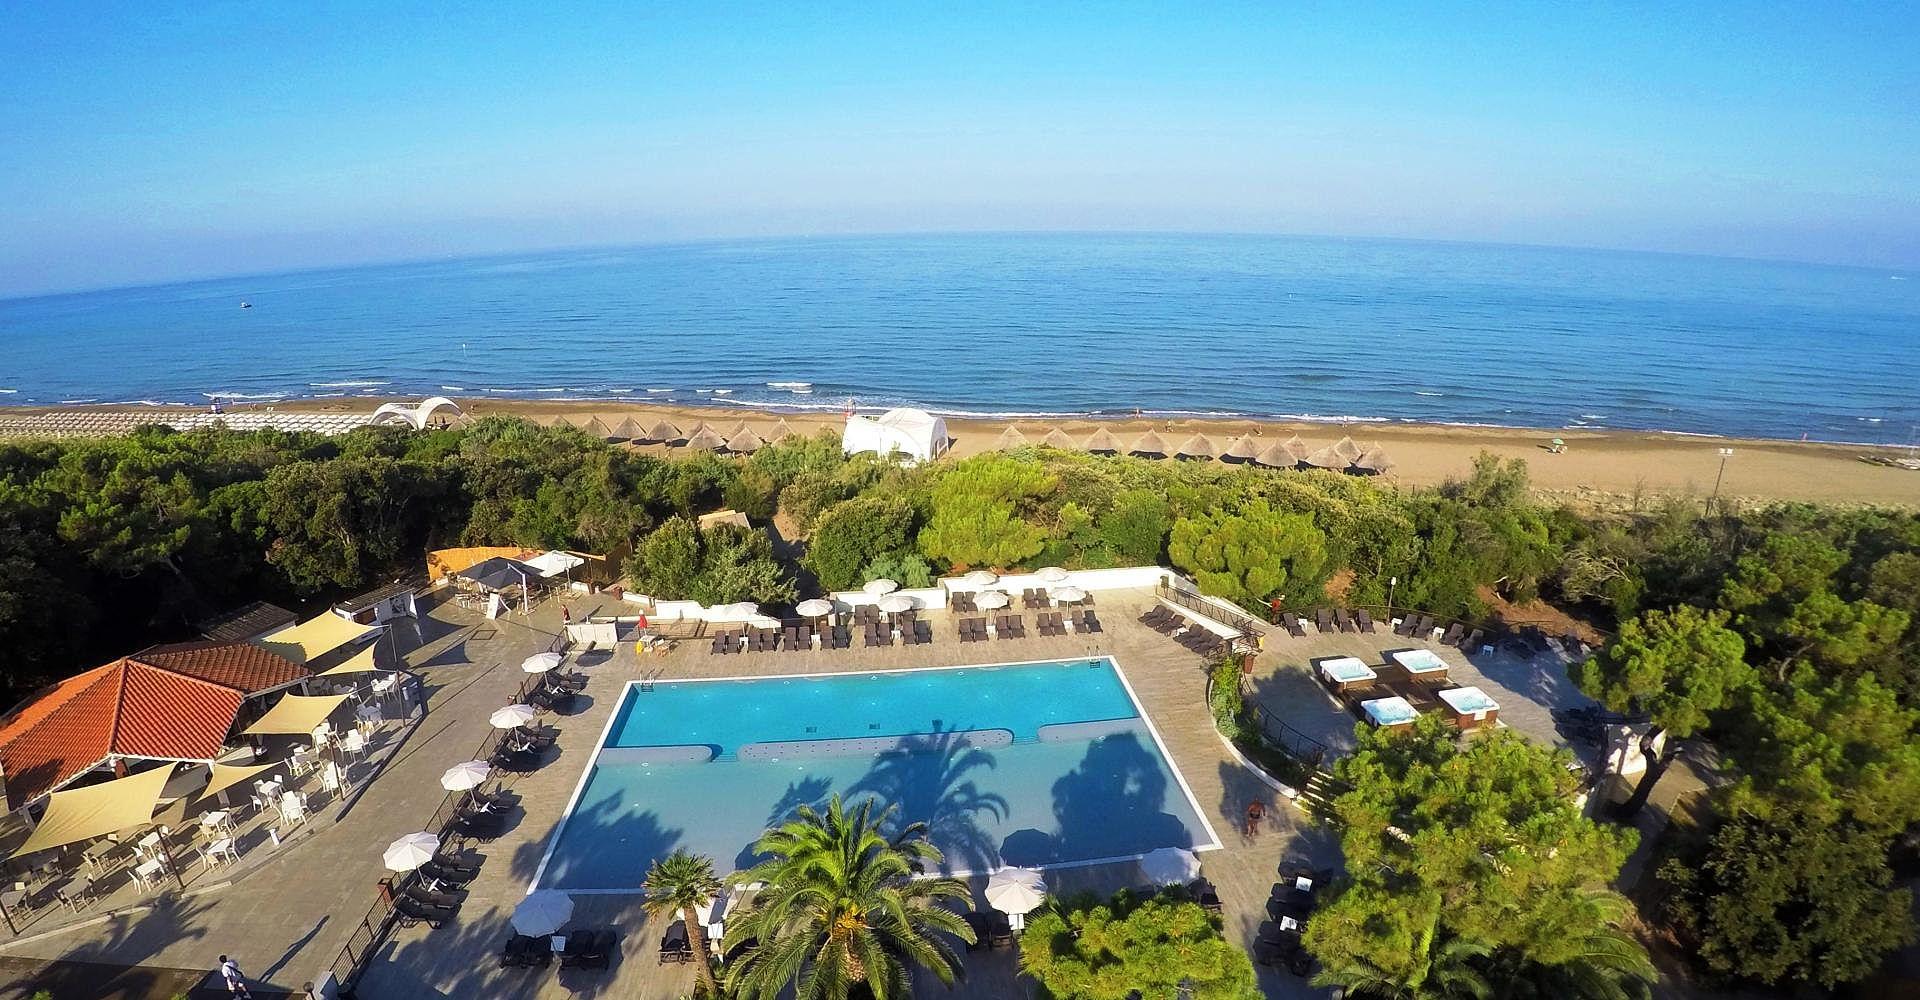 Toskana Strand Karte.Paradu Toskana Eco Resort Toskana Online Zum Bestpreis